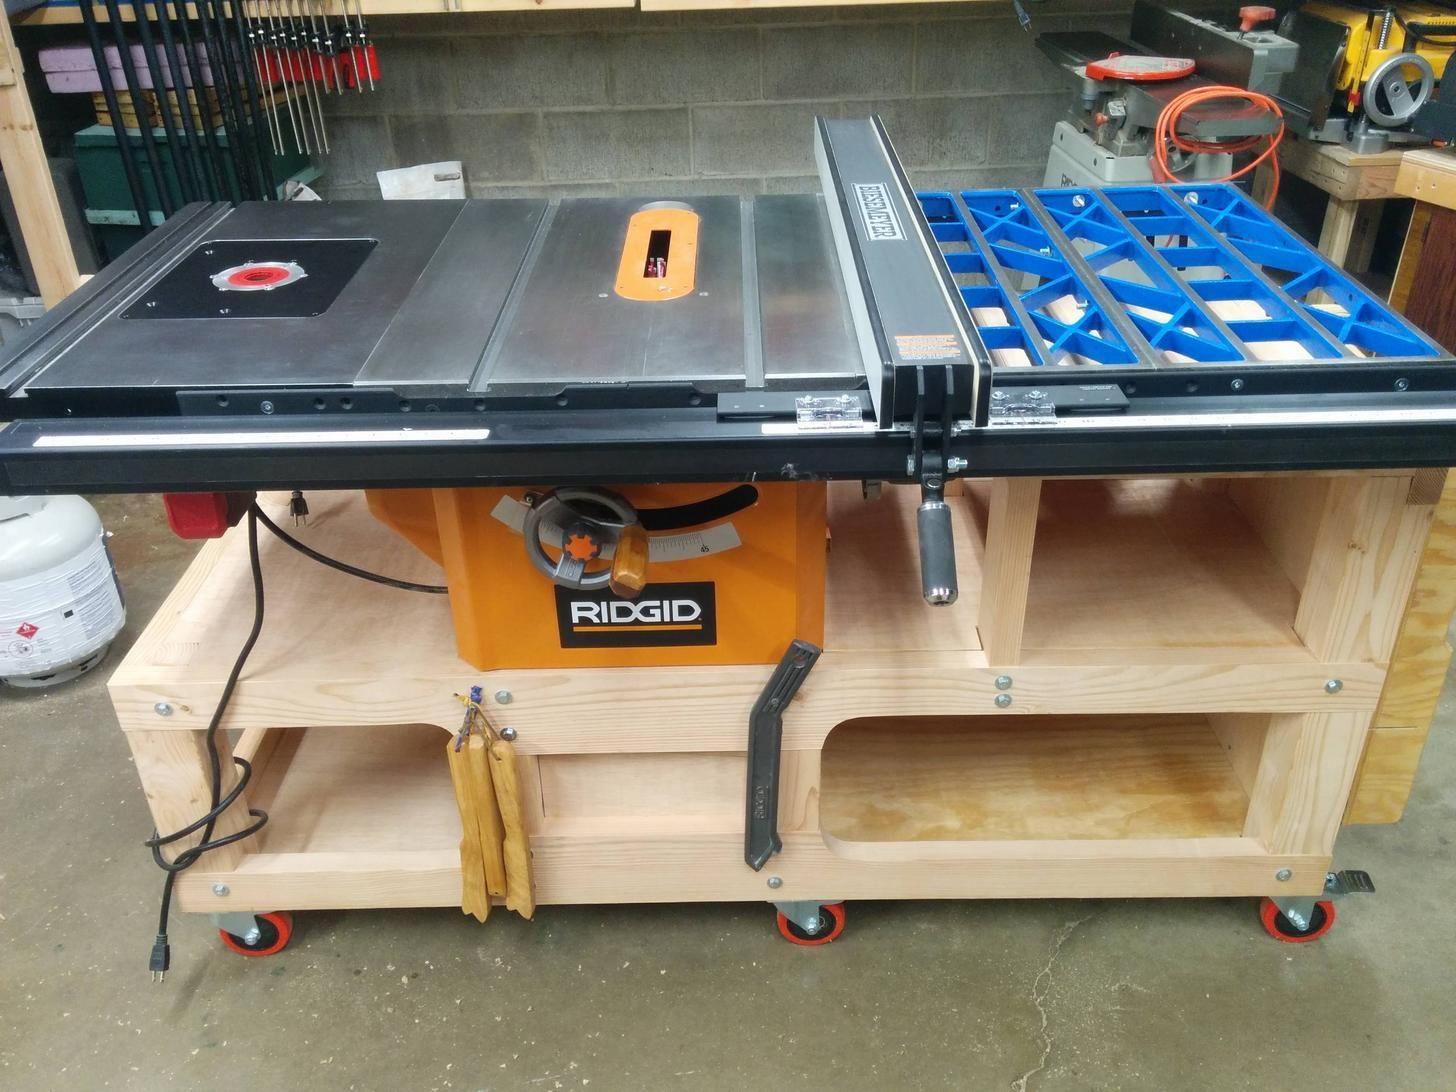 Some Upgrades To My Ridgid R4512 In 2020 Ridgid Table Saw